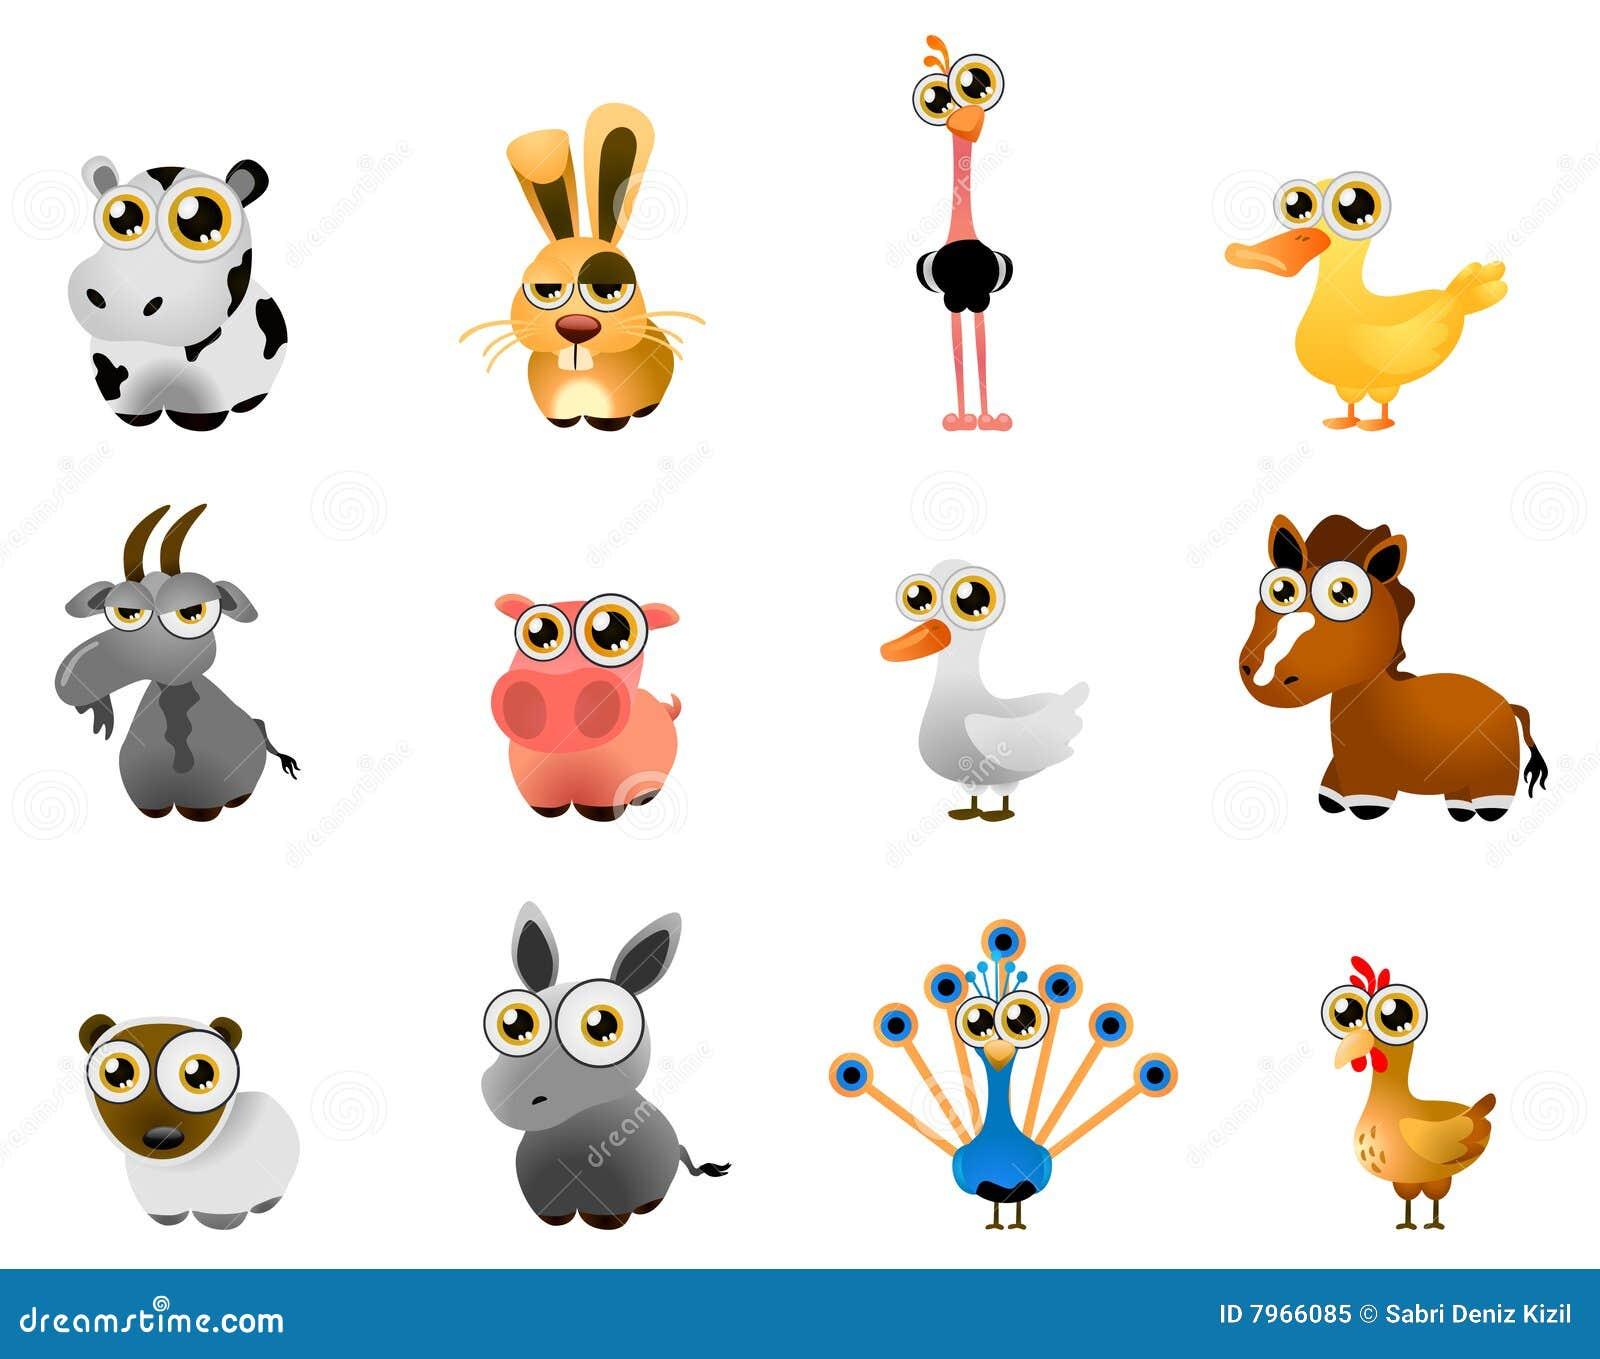 farm animal vector stock vector illustration of farm